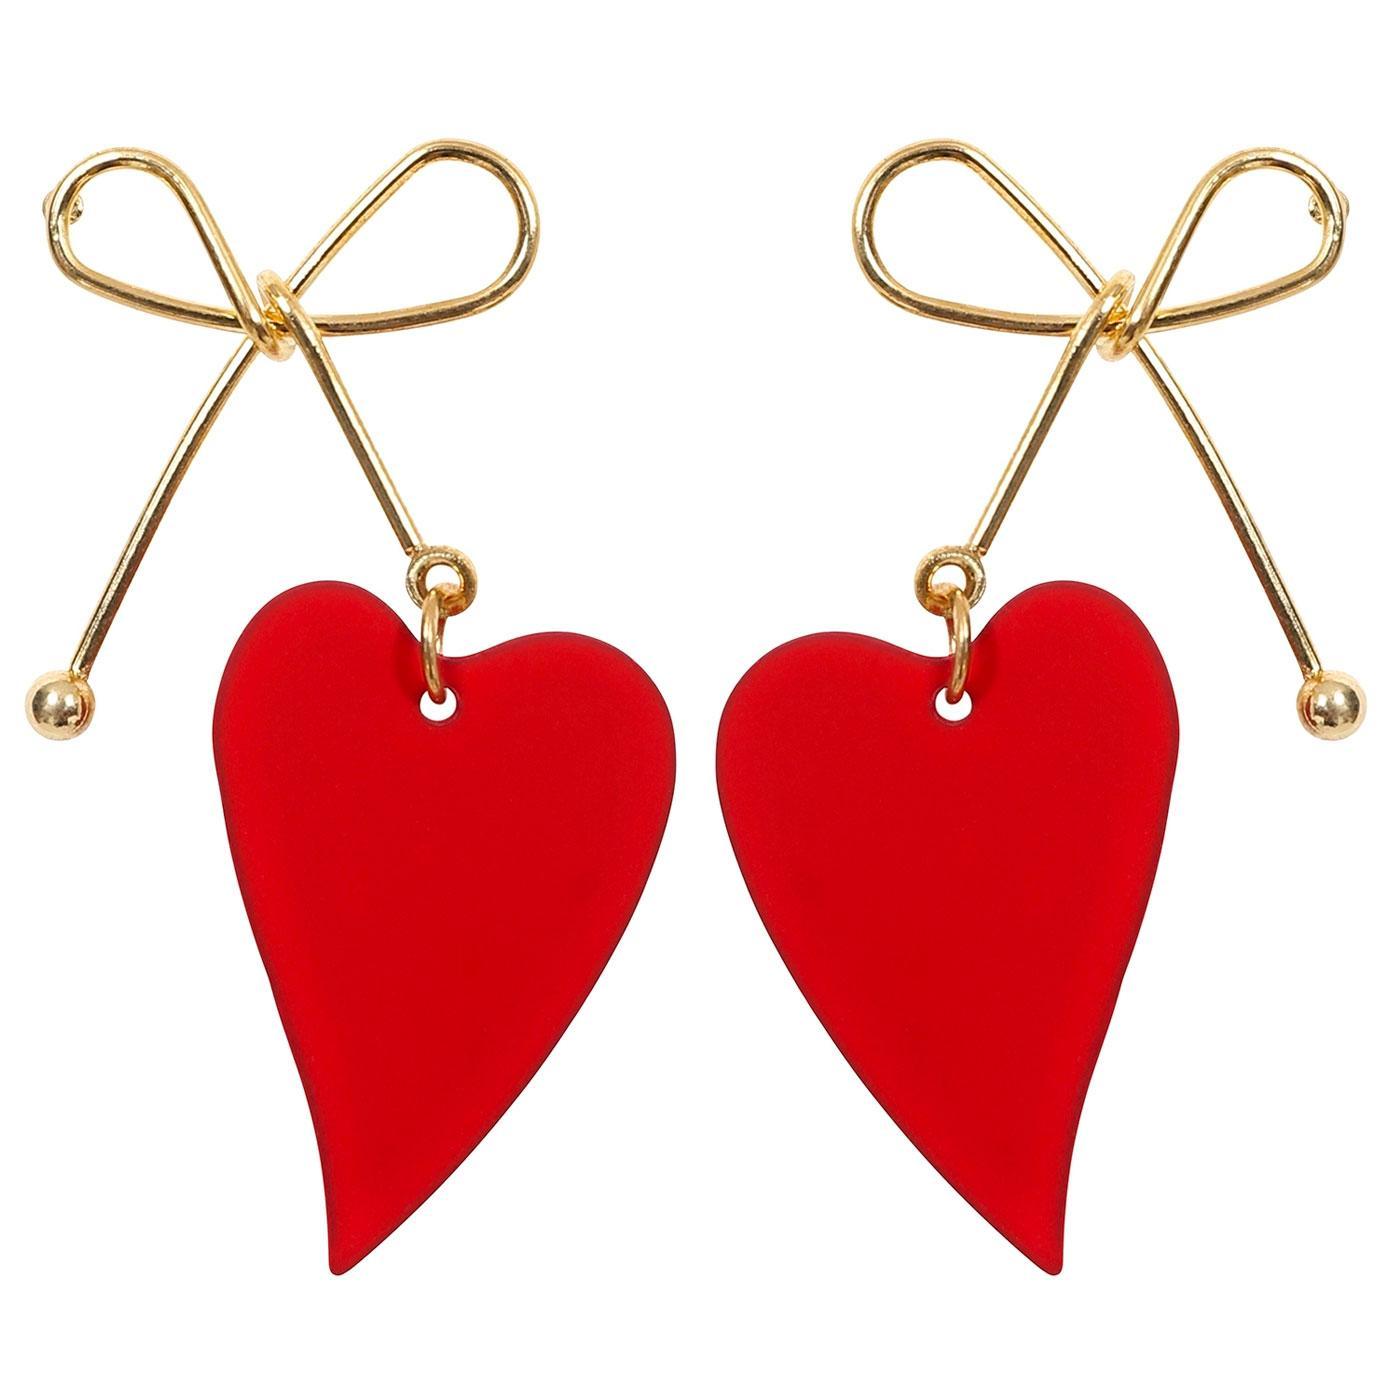 + Pauline COLLECTIF Retro Heart Shaped Earrings